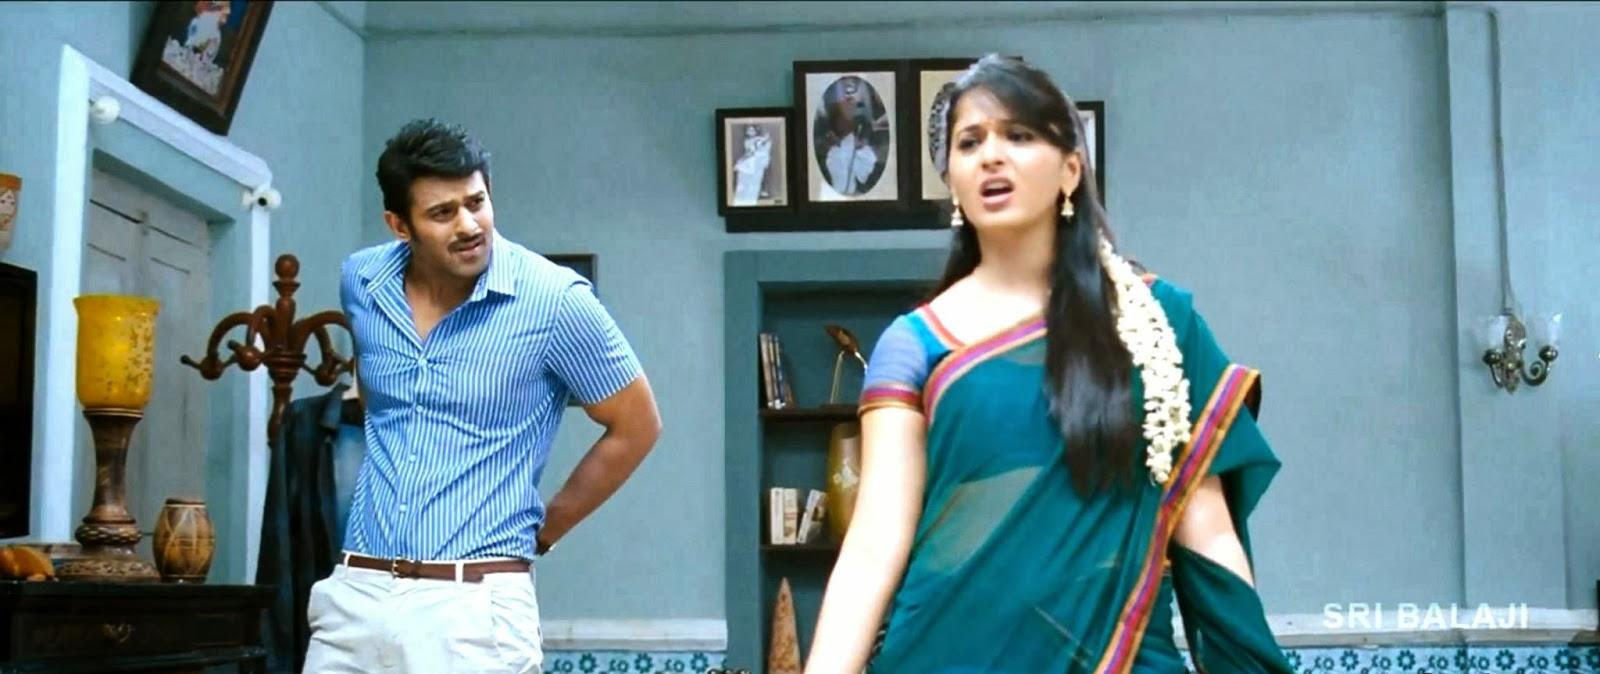 Telugu Movie Wallpapers With Quotes Prabhas Amp Anushka Comedy Scene Snaps Prabhas Pix